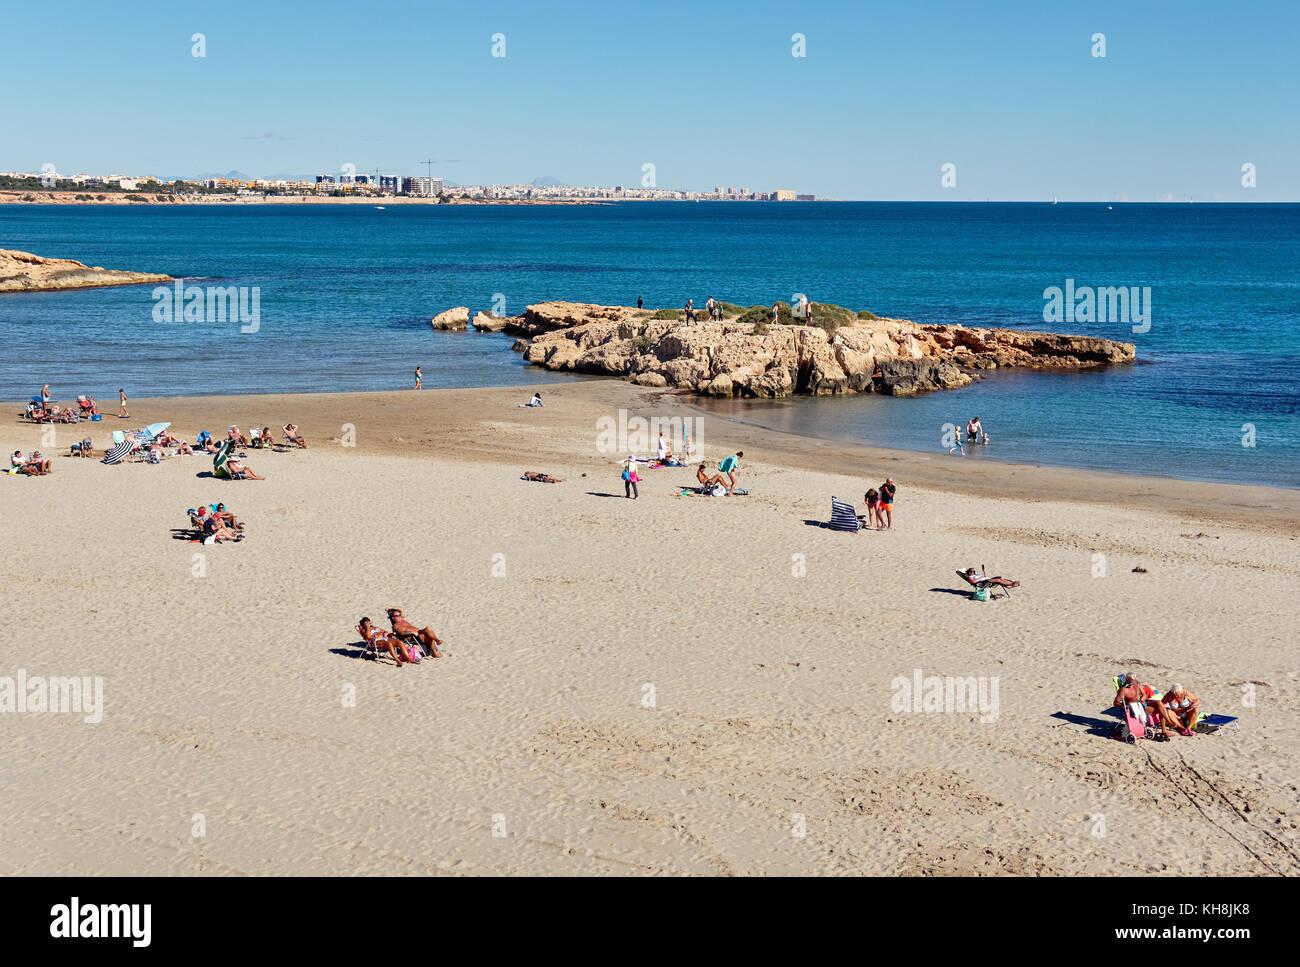 playa espana noviembre